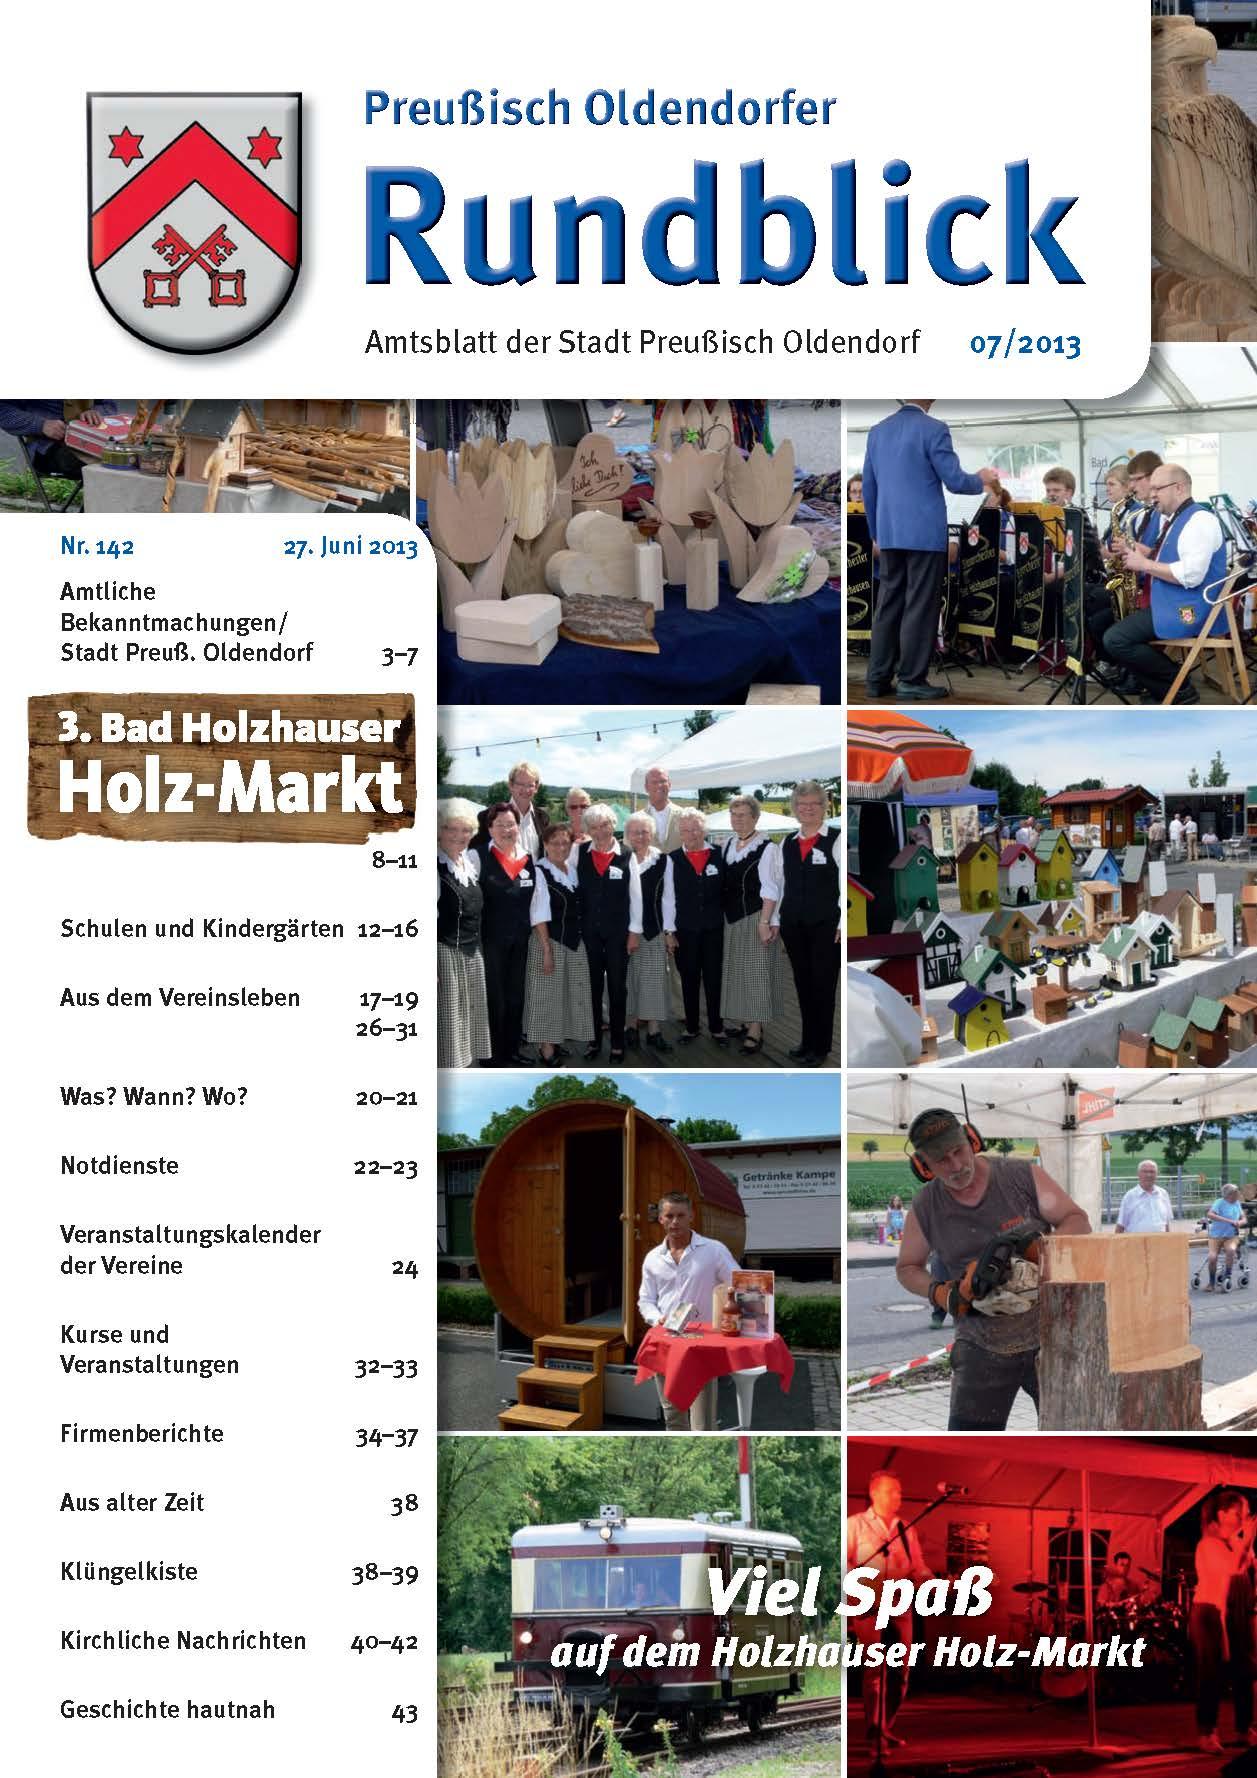 Rundblick 7-2013 Titel